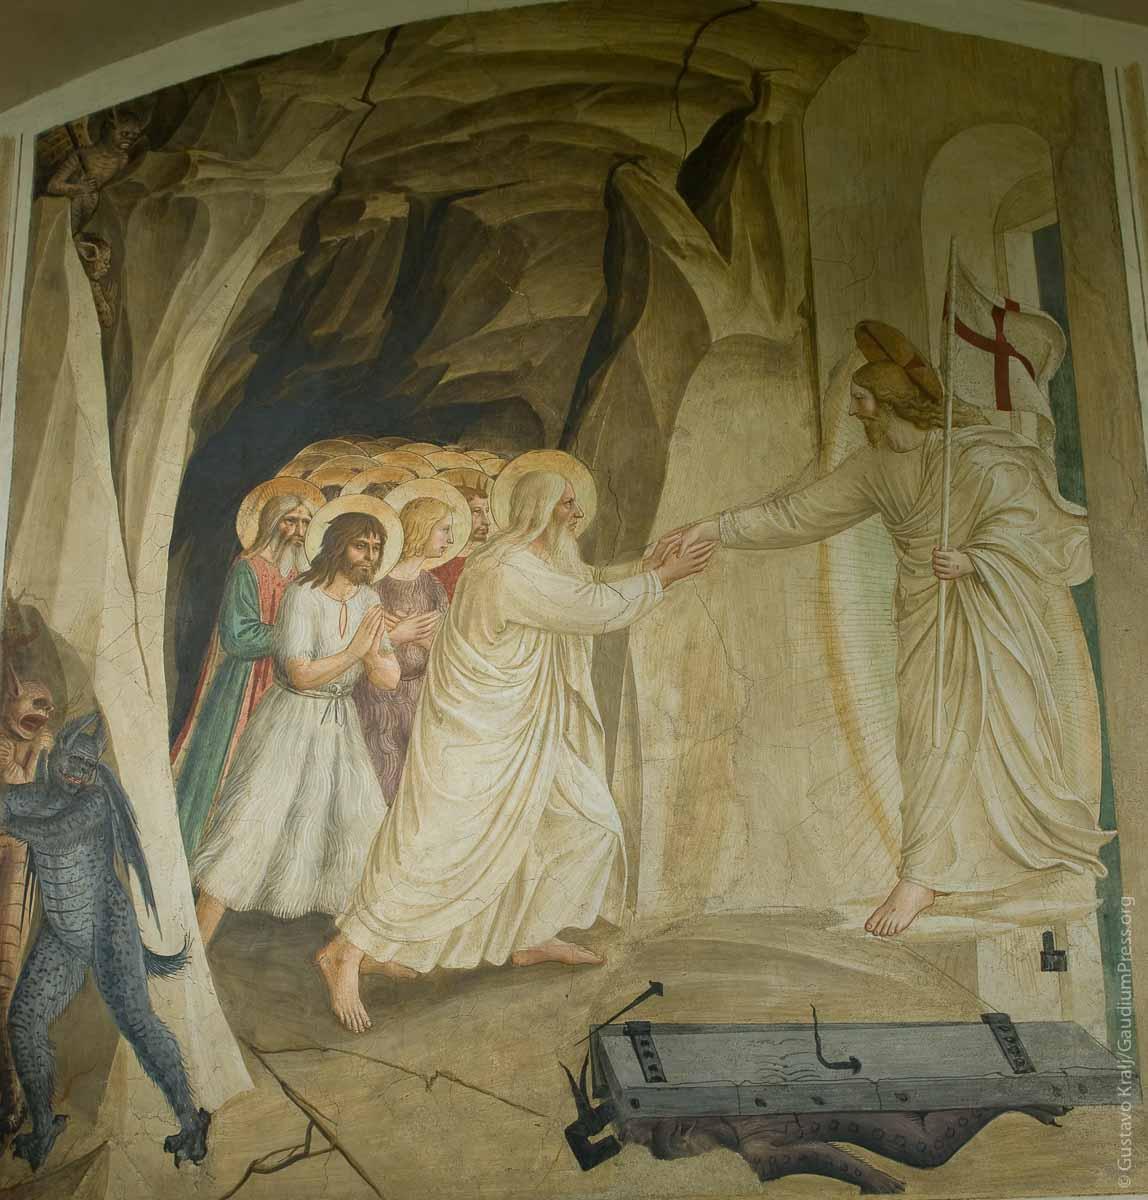 Jesus liberta a los Justos del Limbo. Fresco por Fra Angelico, Firenze. Foto: Gustavo Kralj/GaudiumpressImages.com